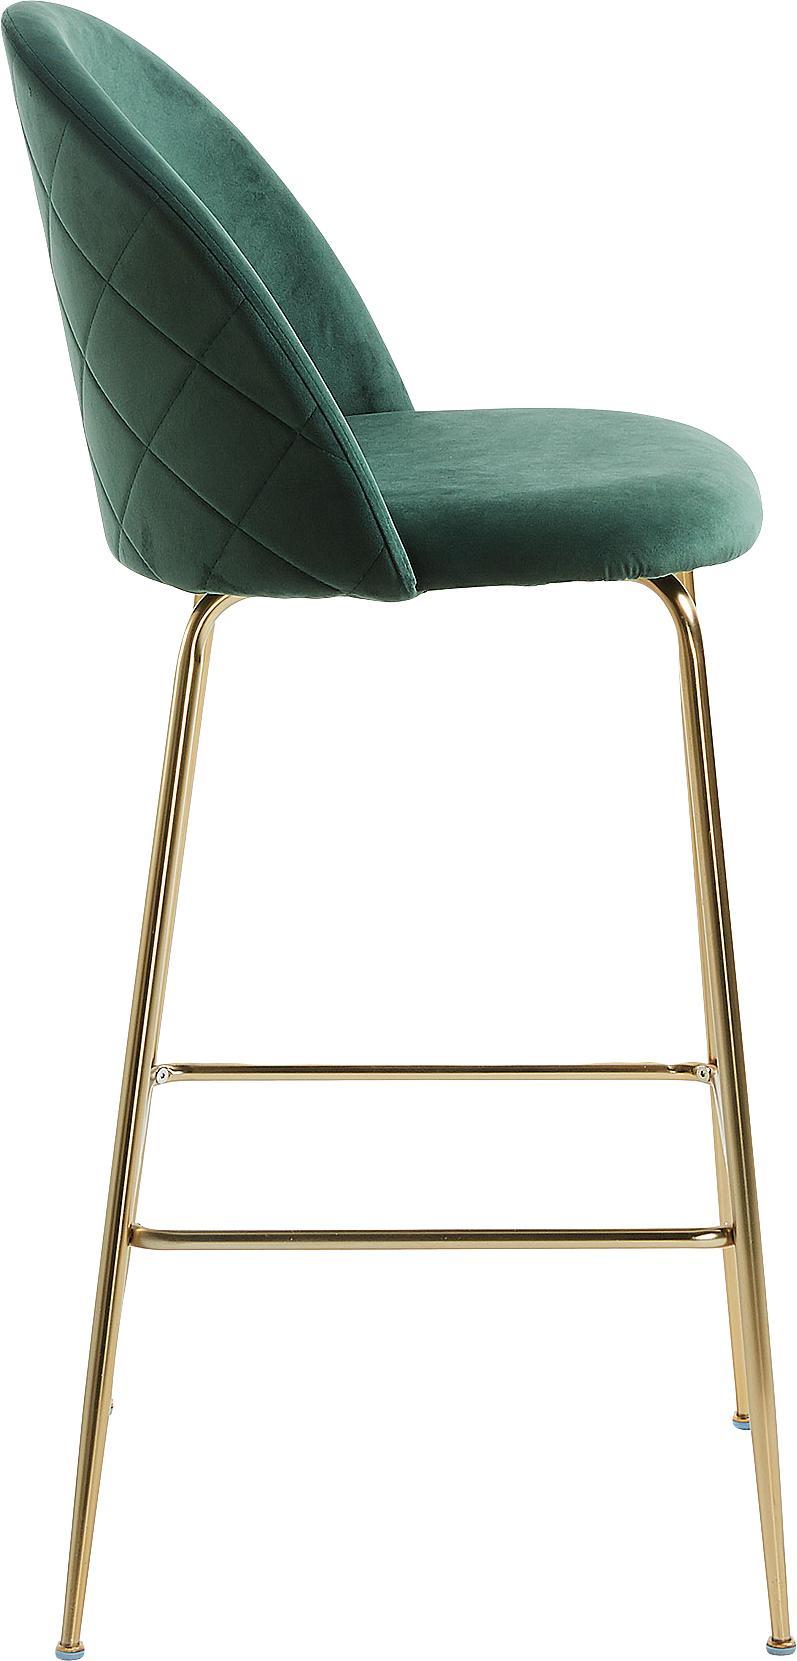 Samt-Barstuhl Ivonne, Bezug: Polyestersamt, Gestell: Metall, lackiert, Dunkelgrün, Goldfarben, 53 x 108 cm